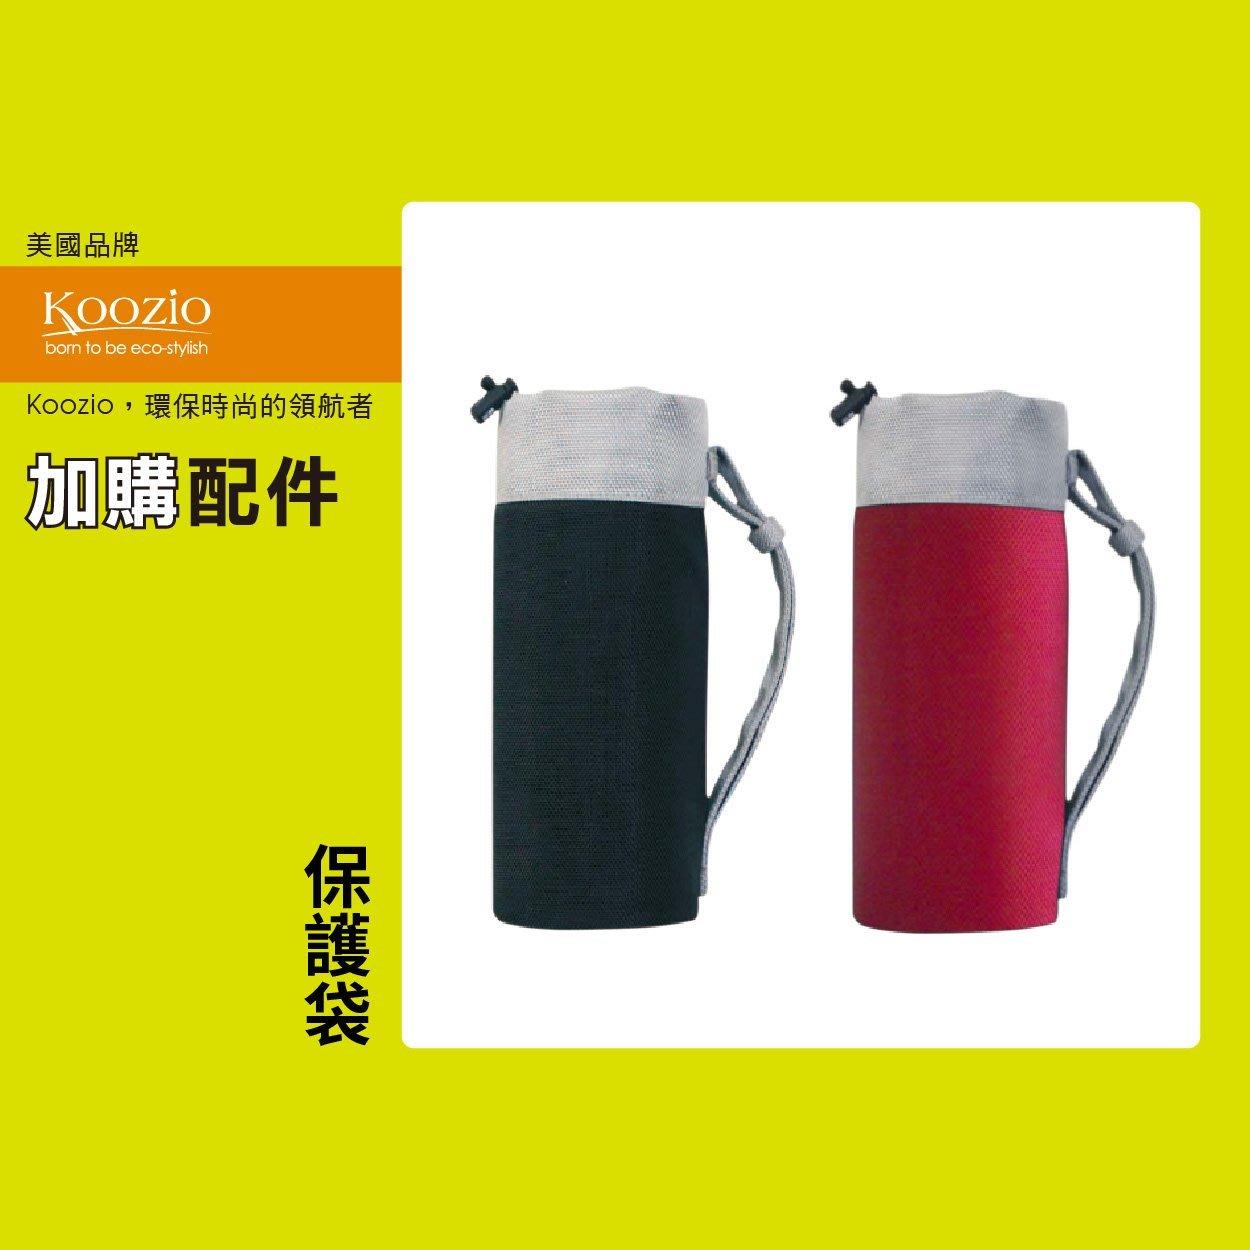 Koozio經典水瓶 1000ml專用保護袋-黑